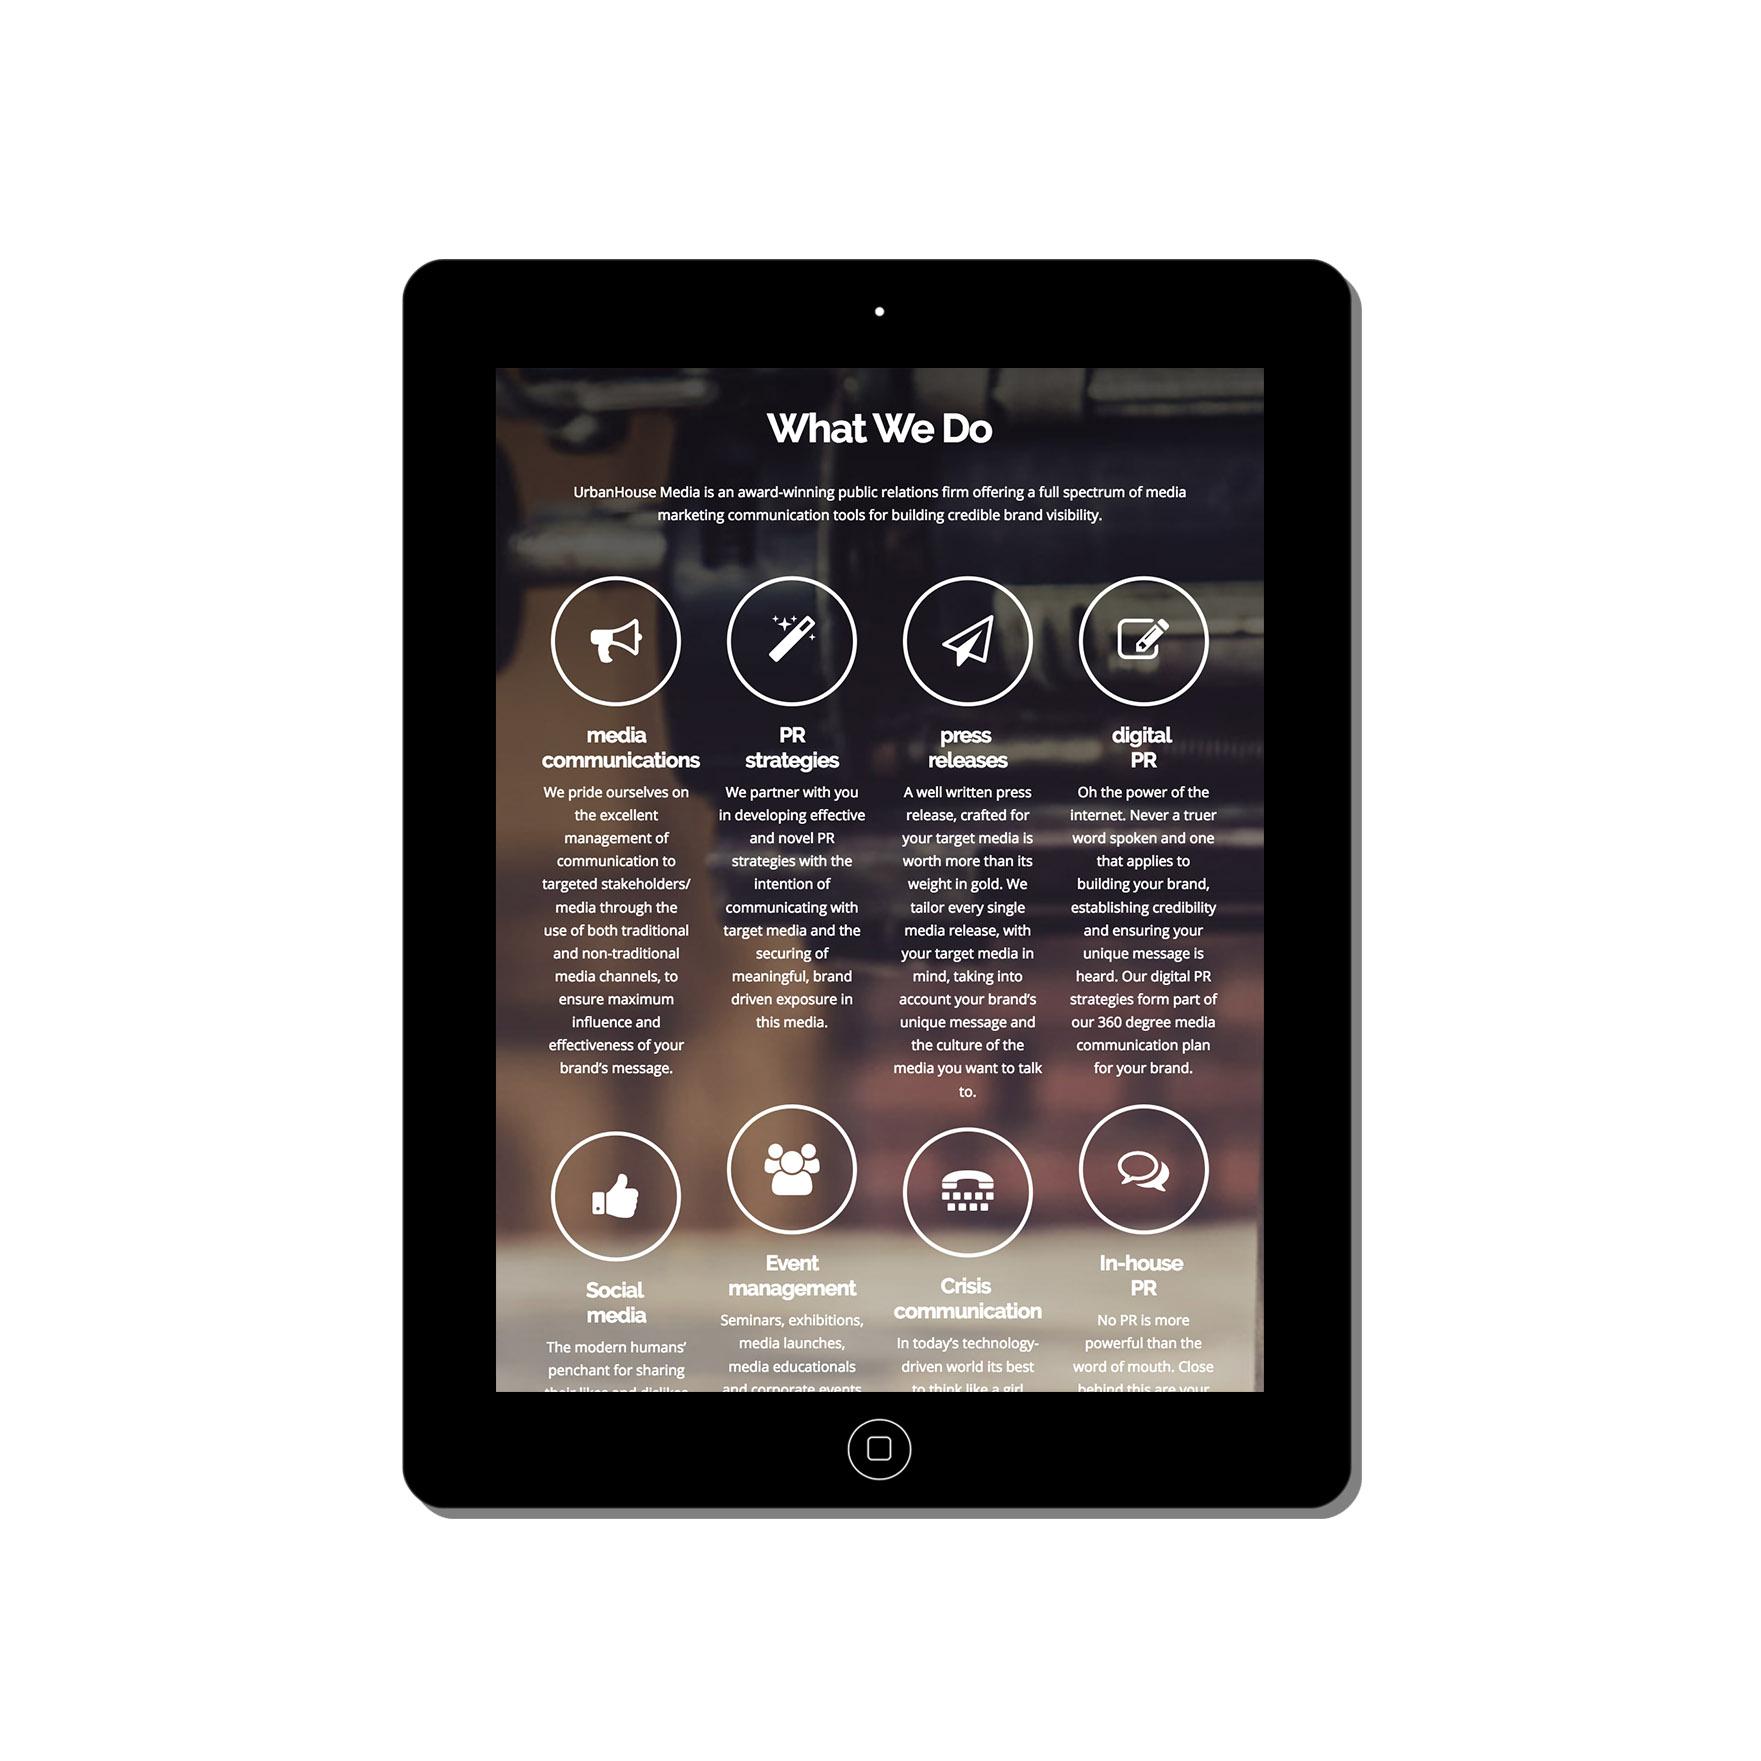 urban house media web-design-portfolio-webdoor-responsive-web-design-agency-hillcrest-kwazulu-natal-tablet